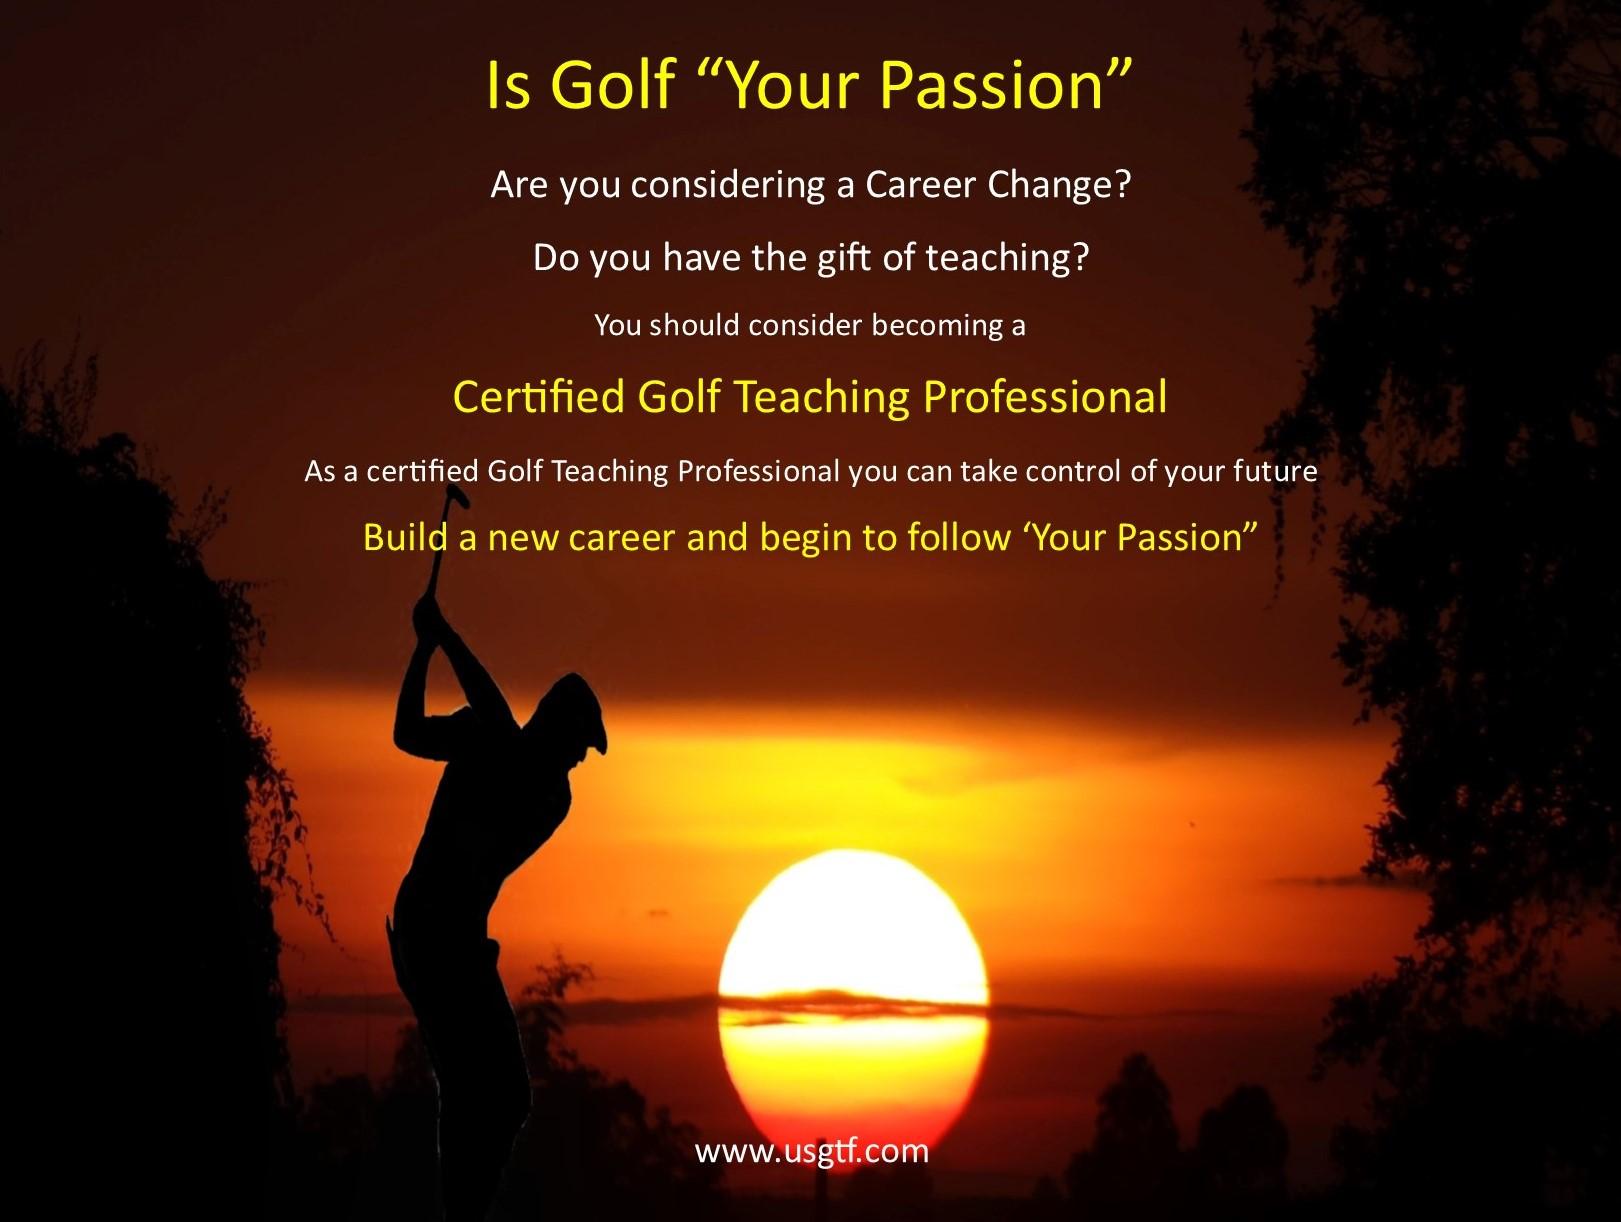 United States Golf Teachers Federation image 3